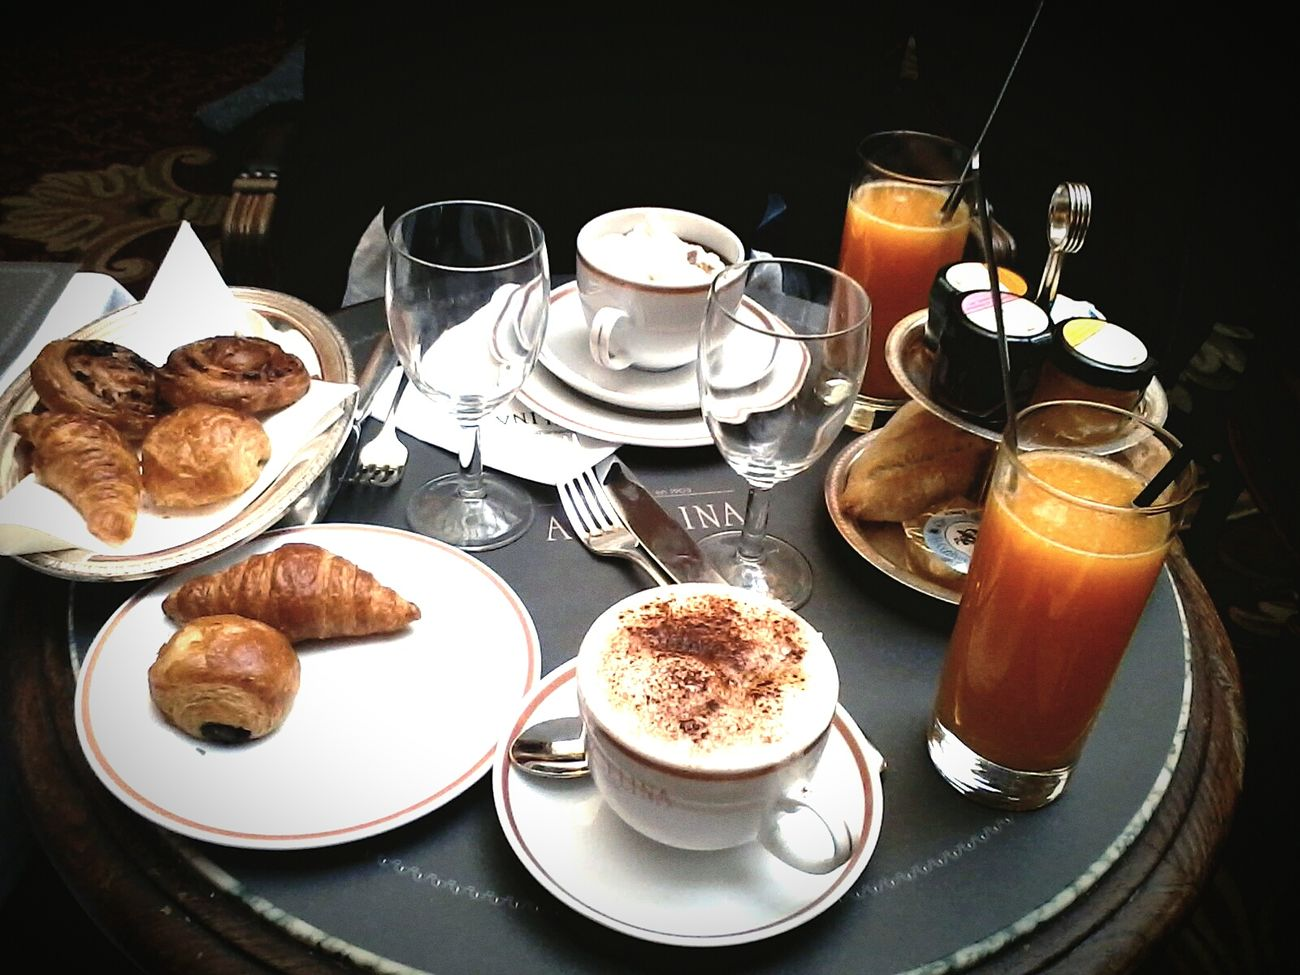 Paris breakfast chez Angelina, rue de Rivoli, Paris. Paris Paris Je T Aime Angelina Paris, France  Paris ❤ France Breakfast